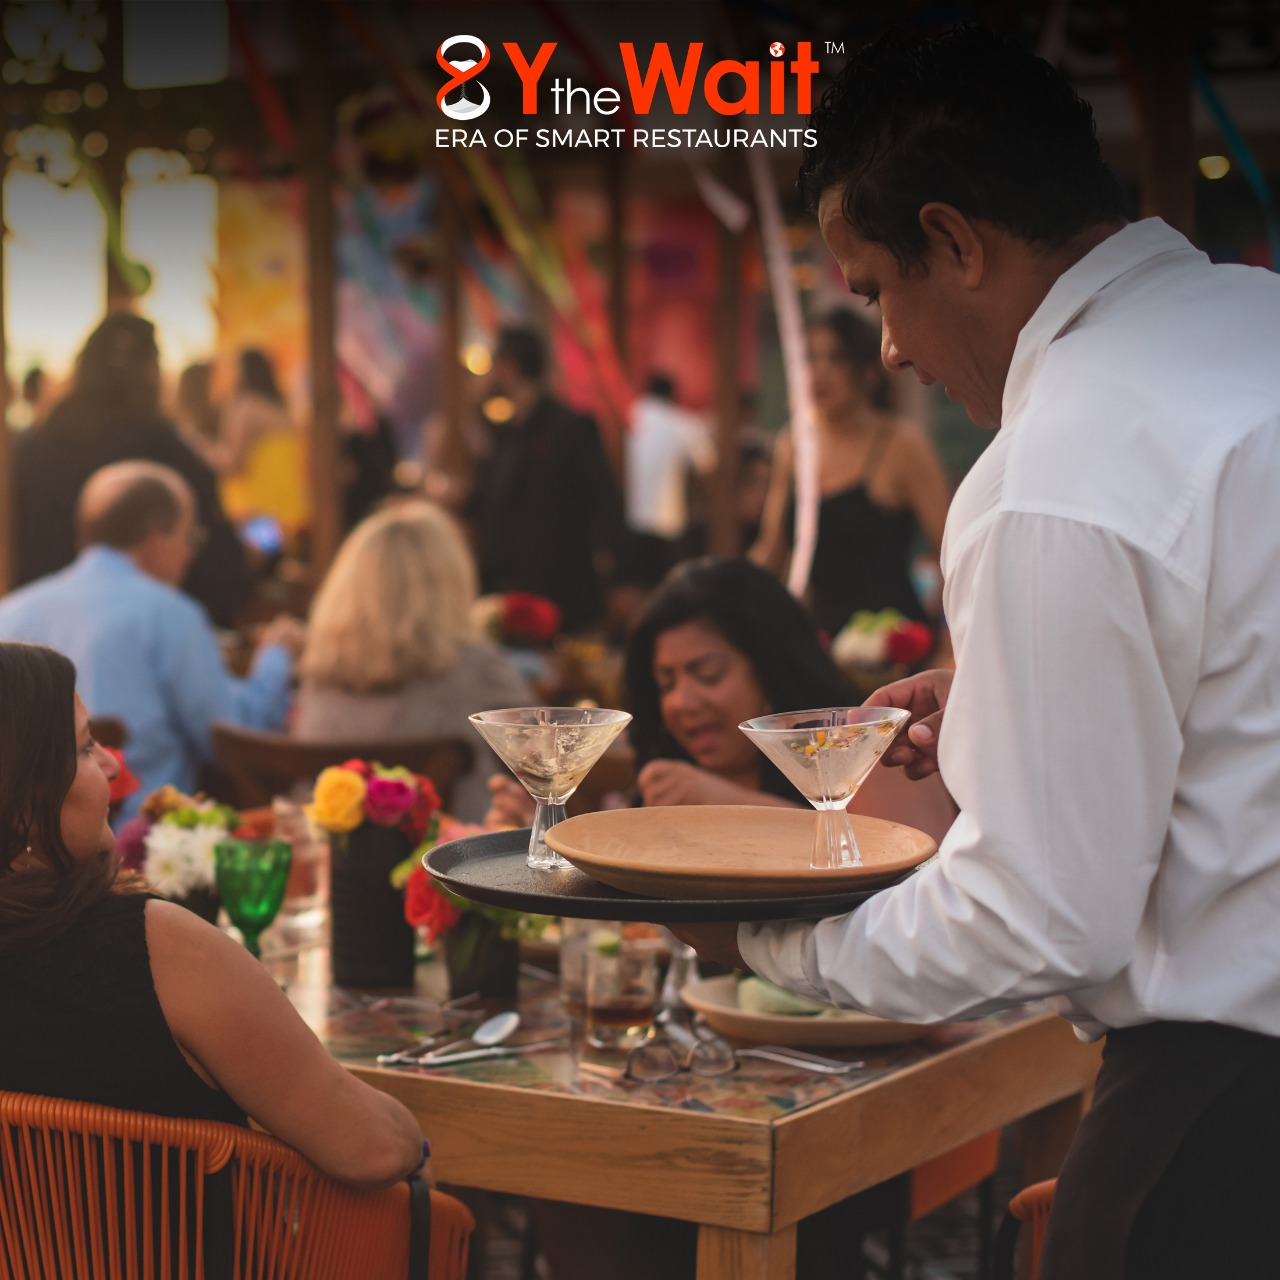 Y the Wait - Digital Waiter App - Waiter Serving